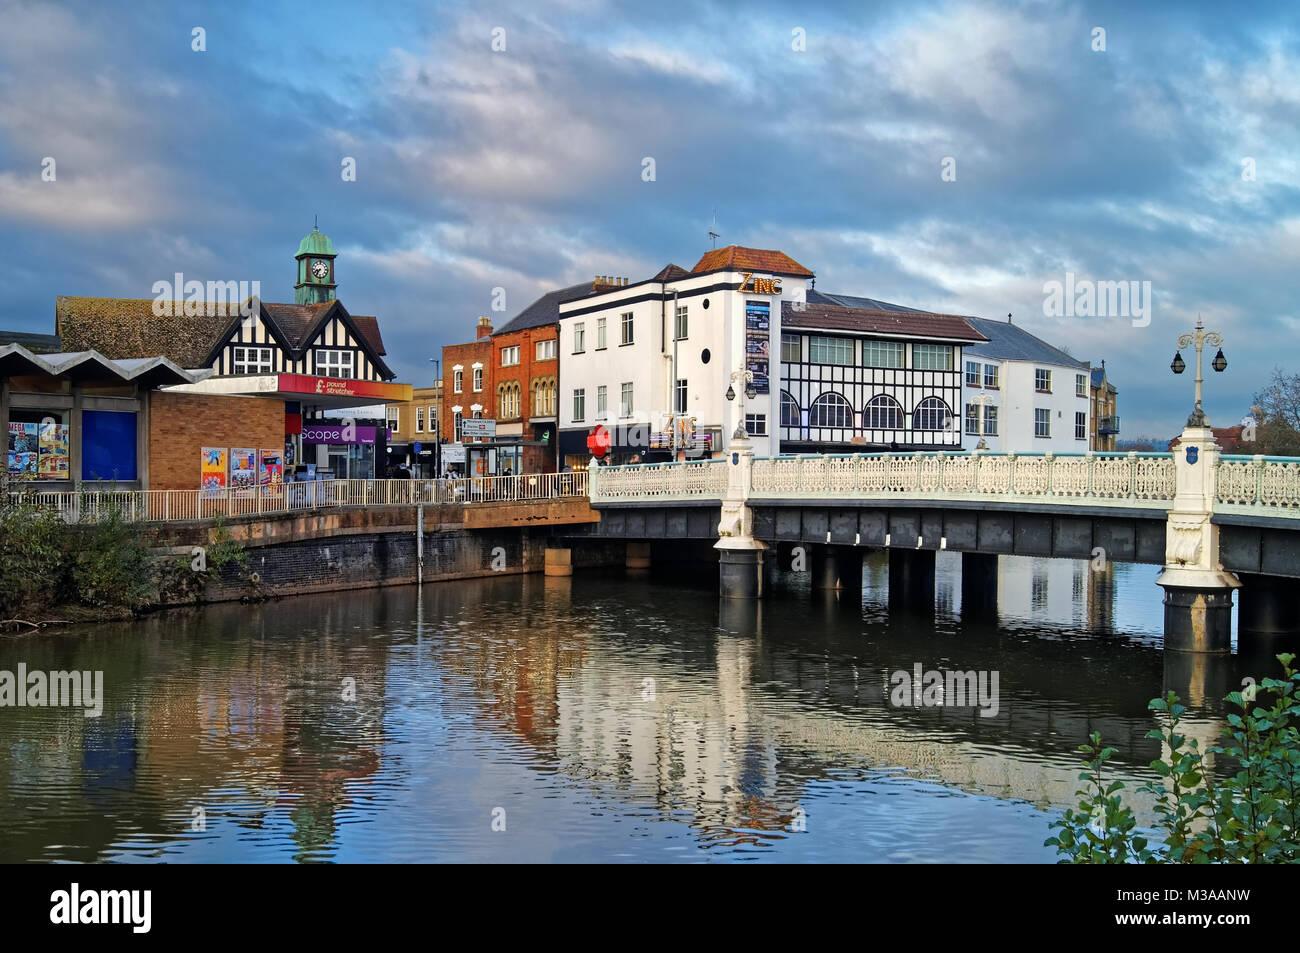 UK,Somerset,Taunton,Tone Bridge crossing the River Tone - Stock Image